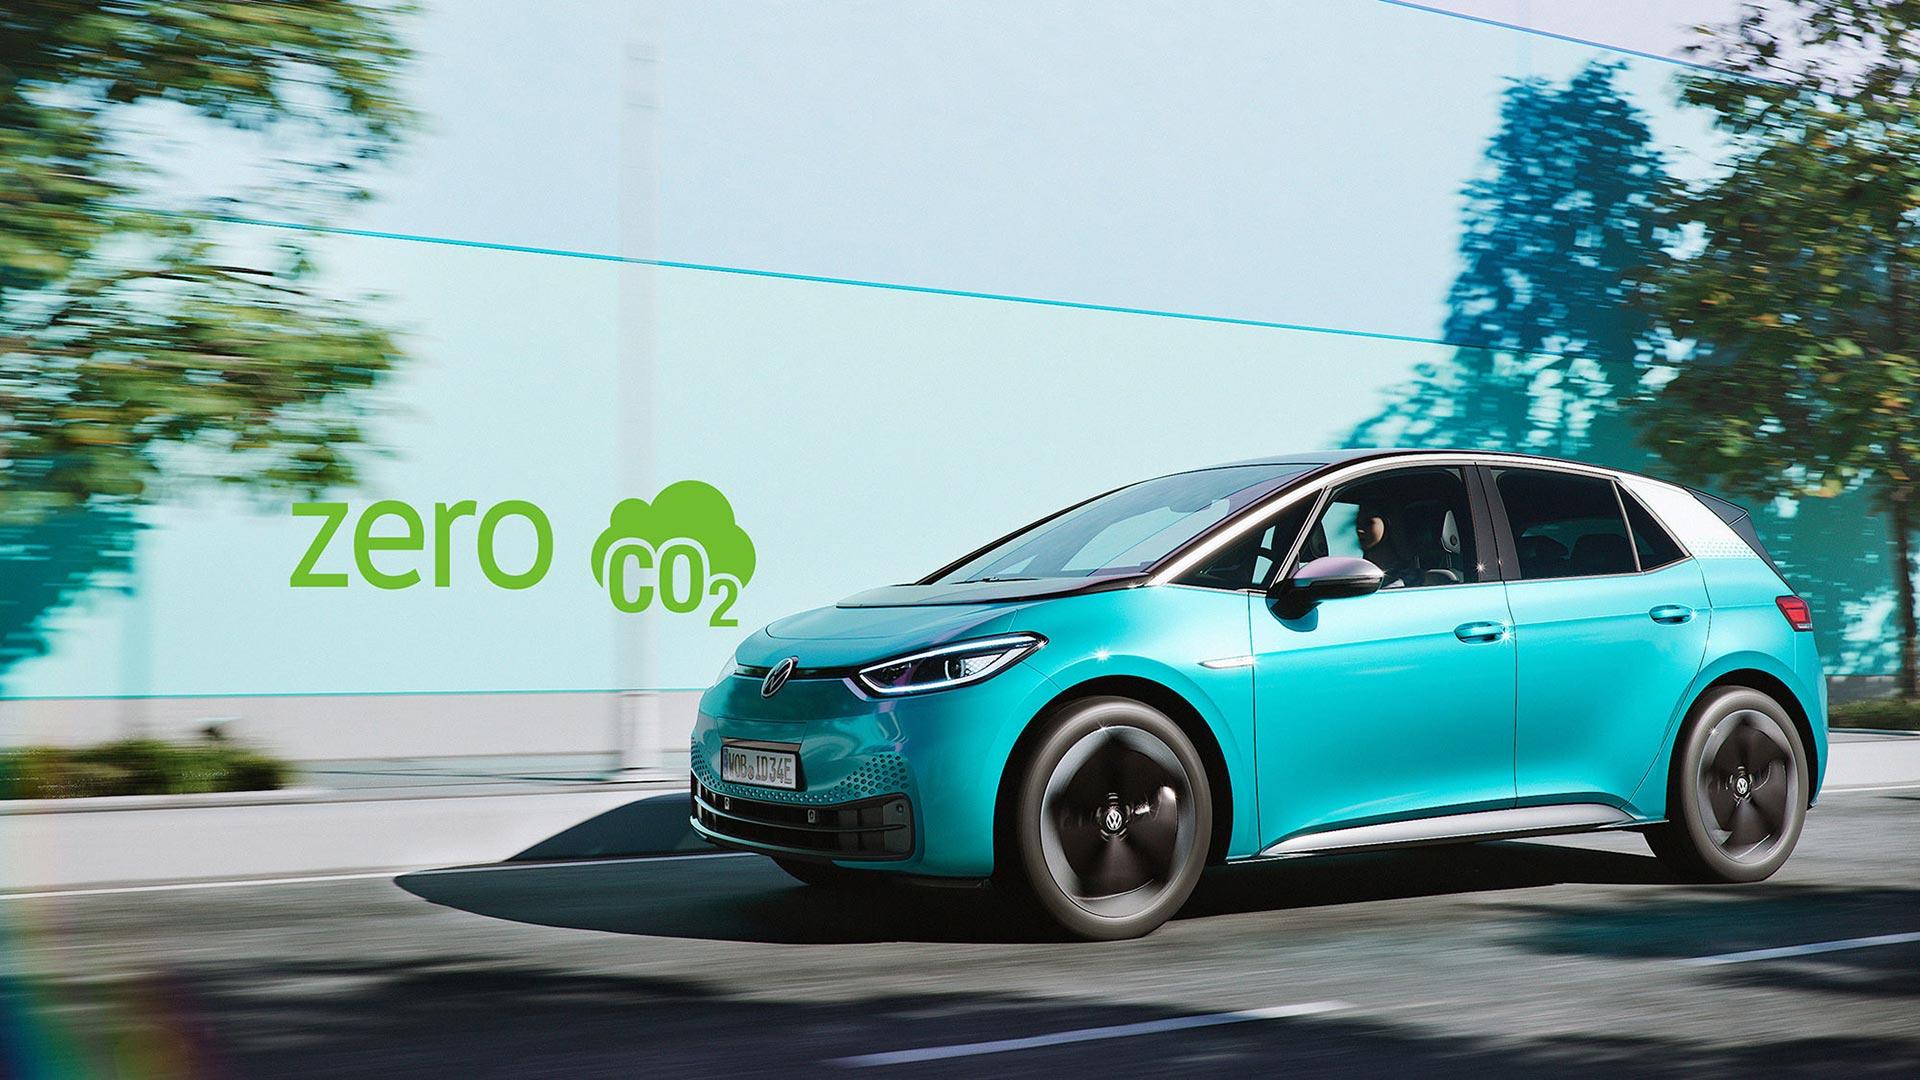 Turkos VW ID3 zero CO2